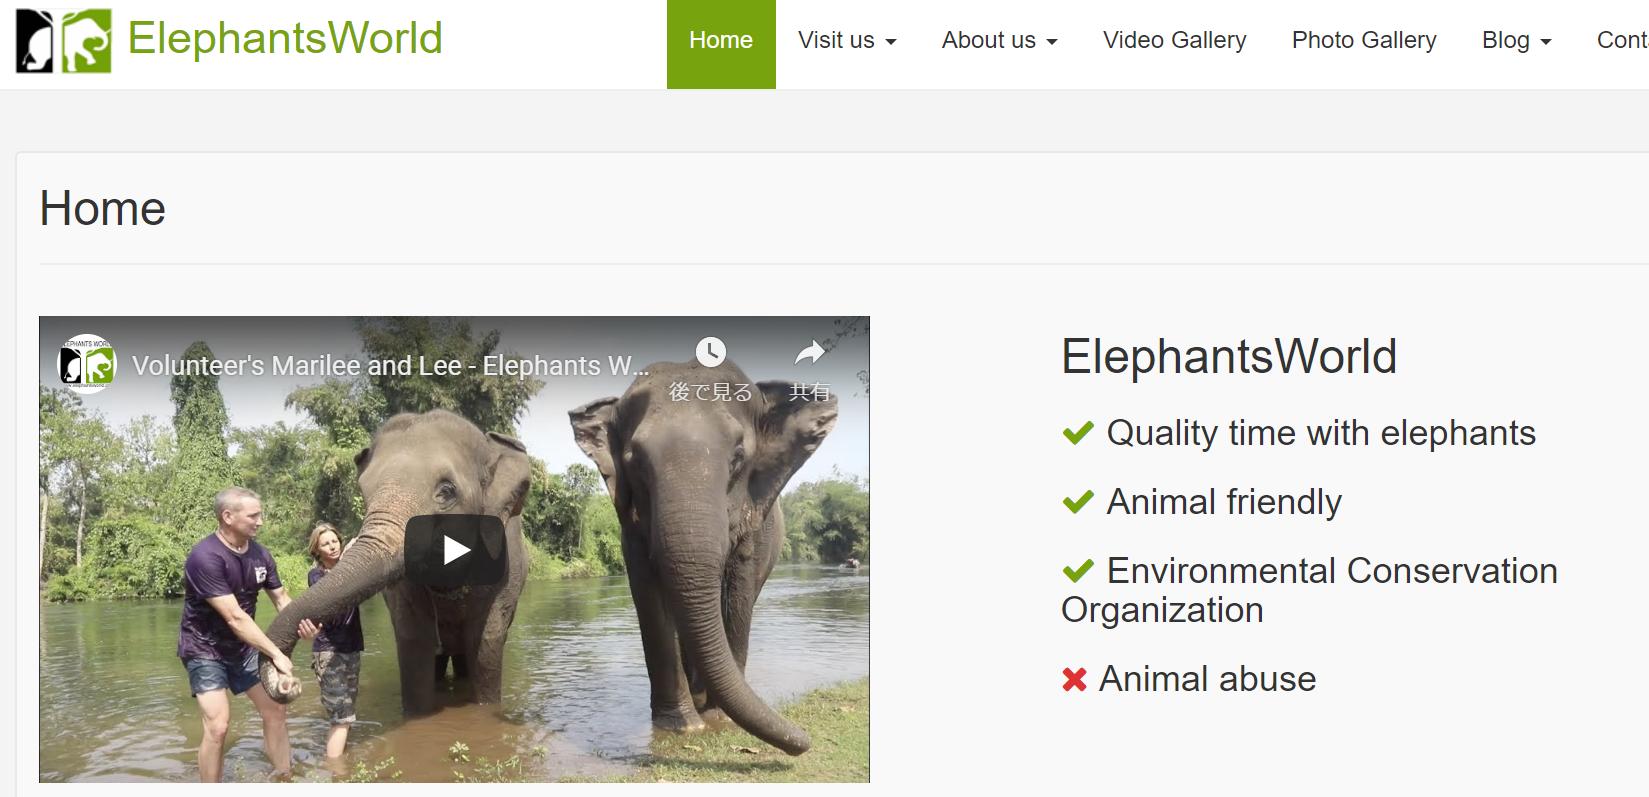 elephantsworldhp